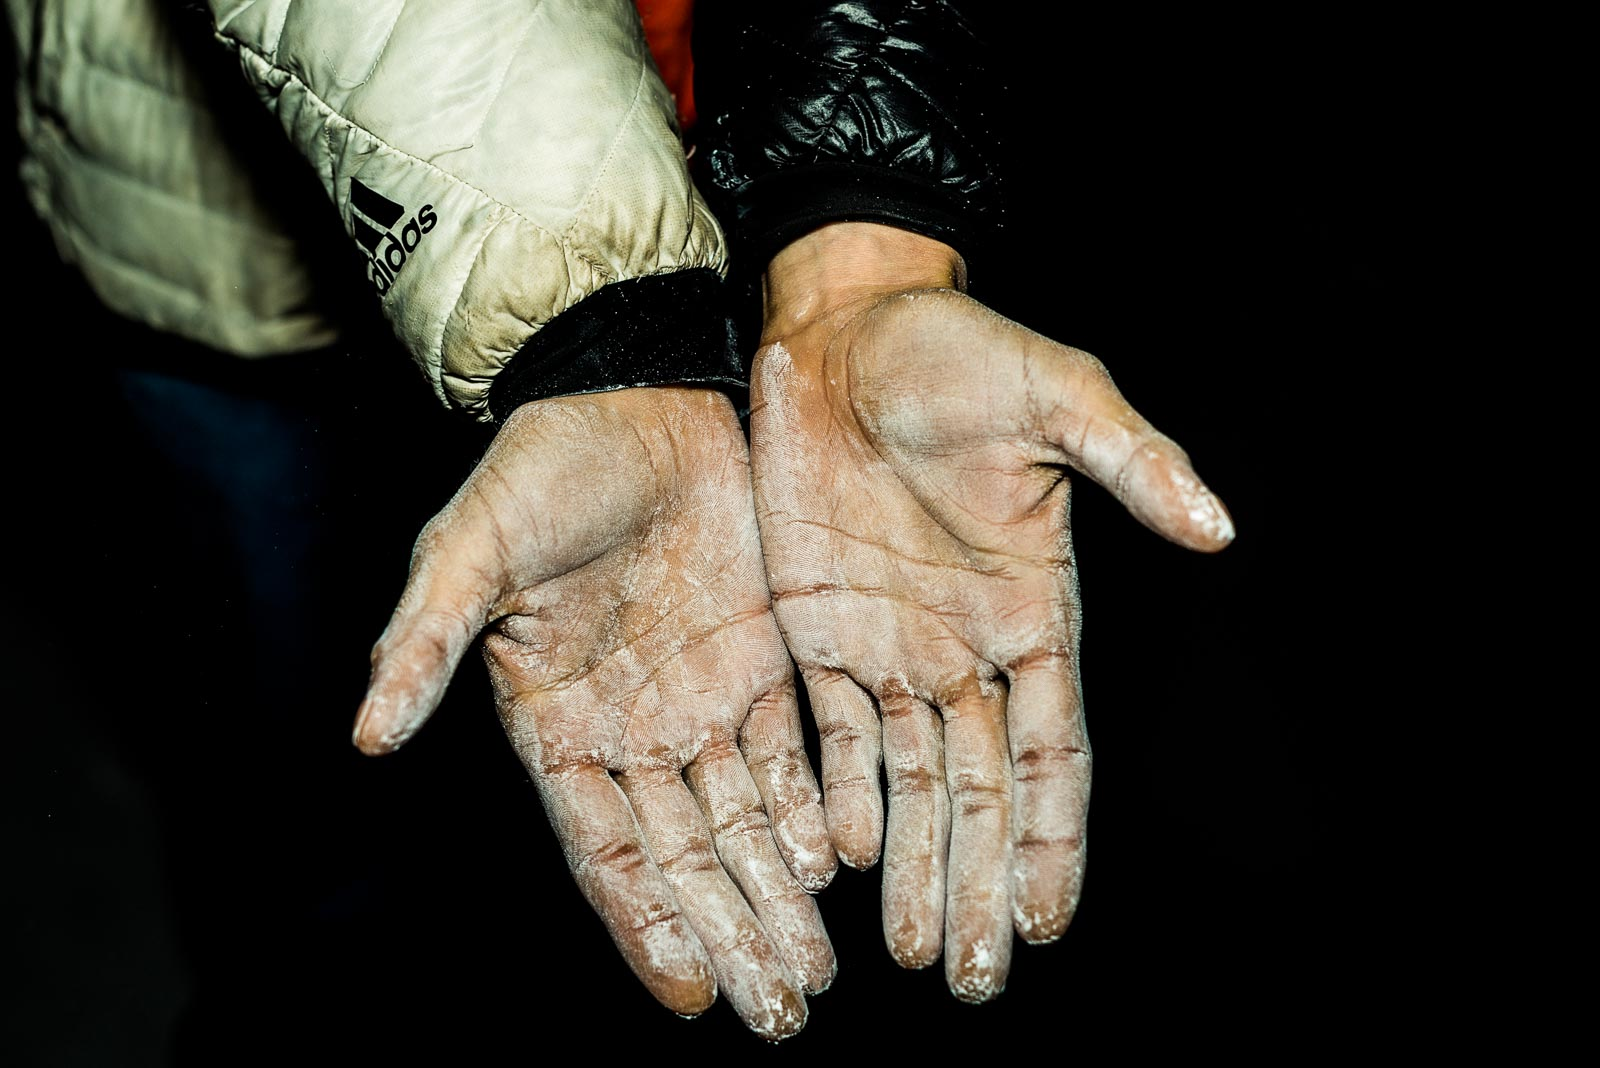 Hands of top French climber Mélissa Le Nevé